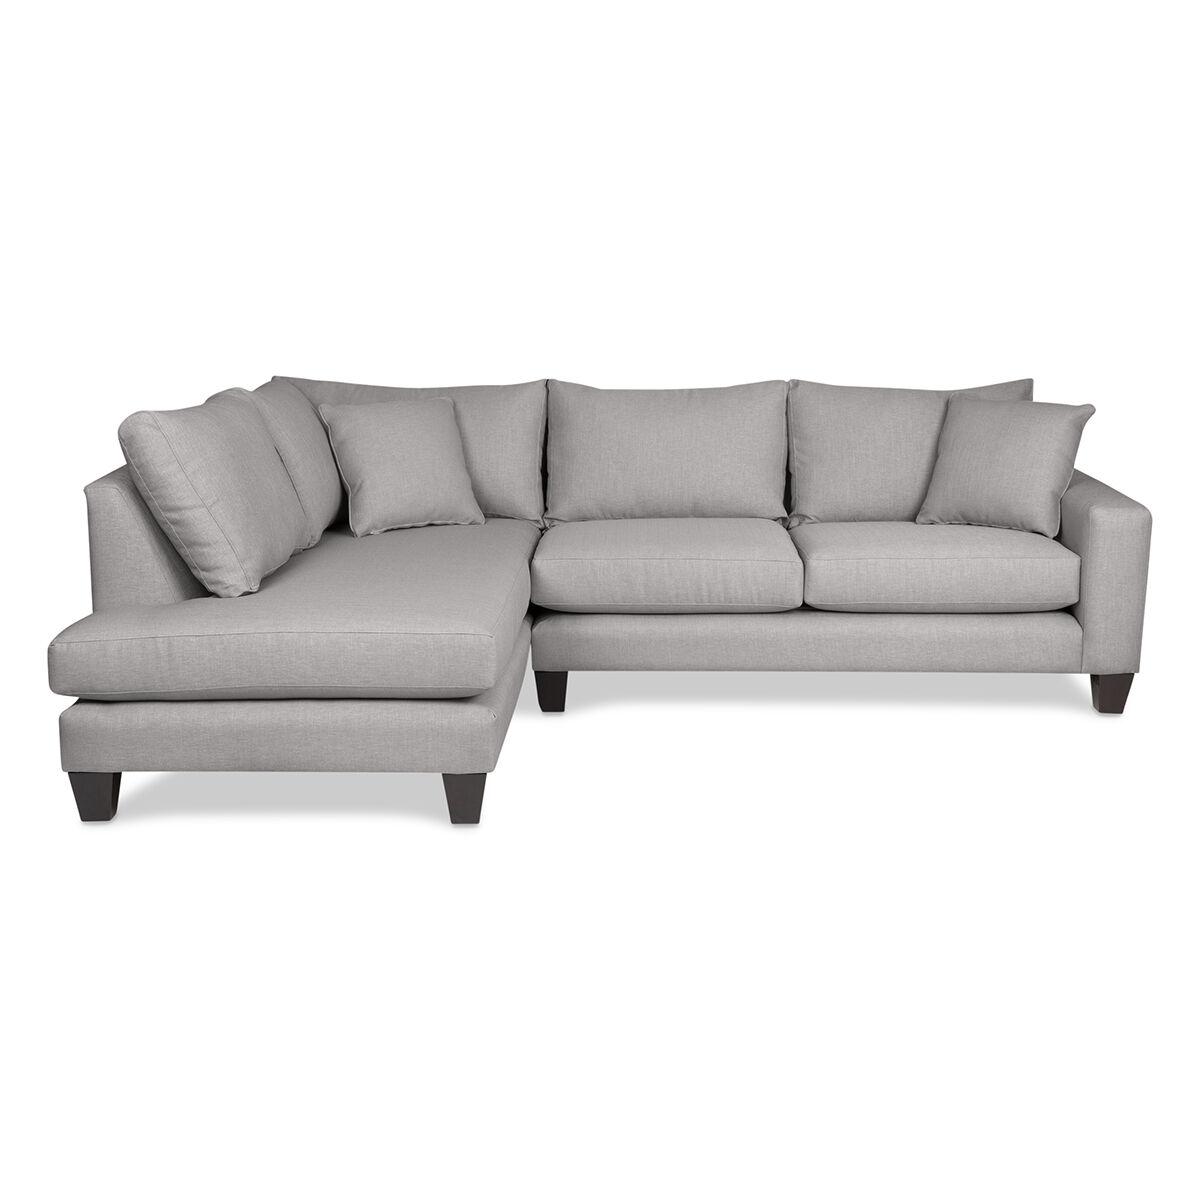 custom sectional sofa plans designs sectionals living urban barn bronx